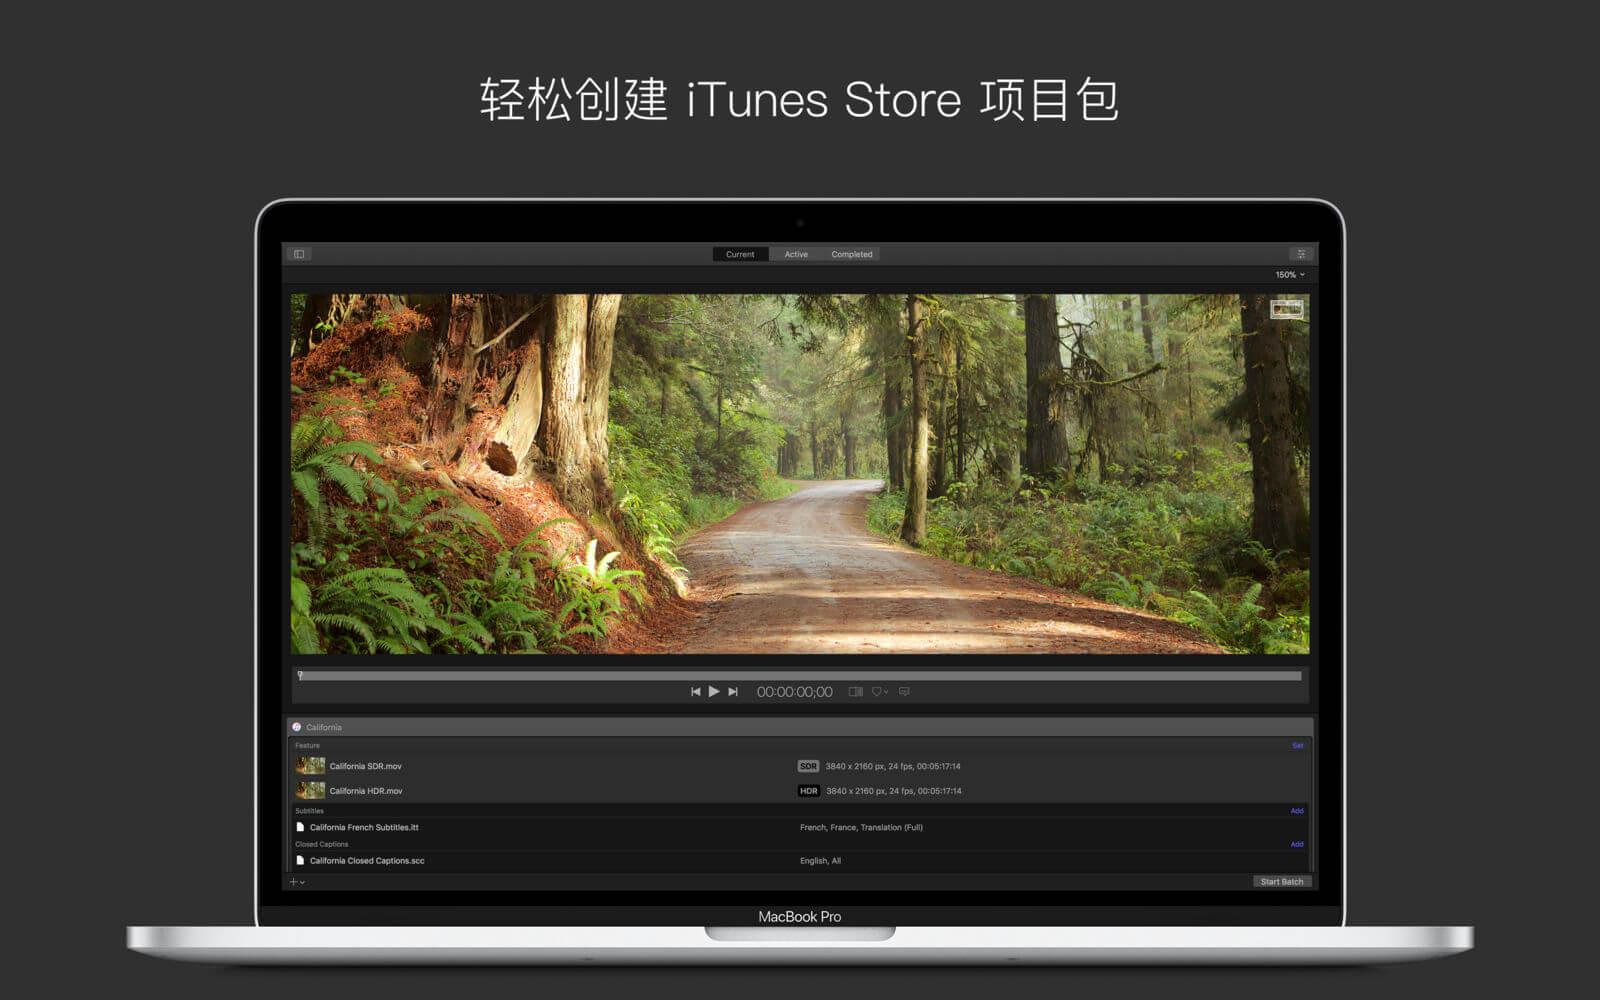 Apple Compressor 4.4.3 破解版免费下载 中英文版 苹果视频压缩编码转码输出软件